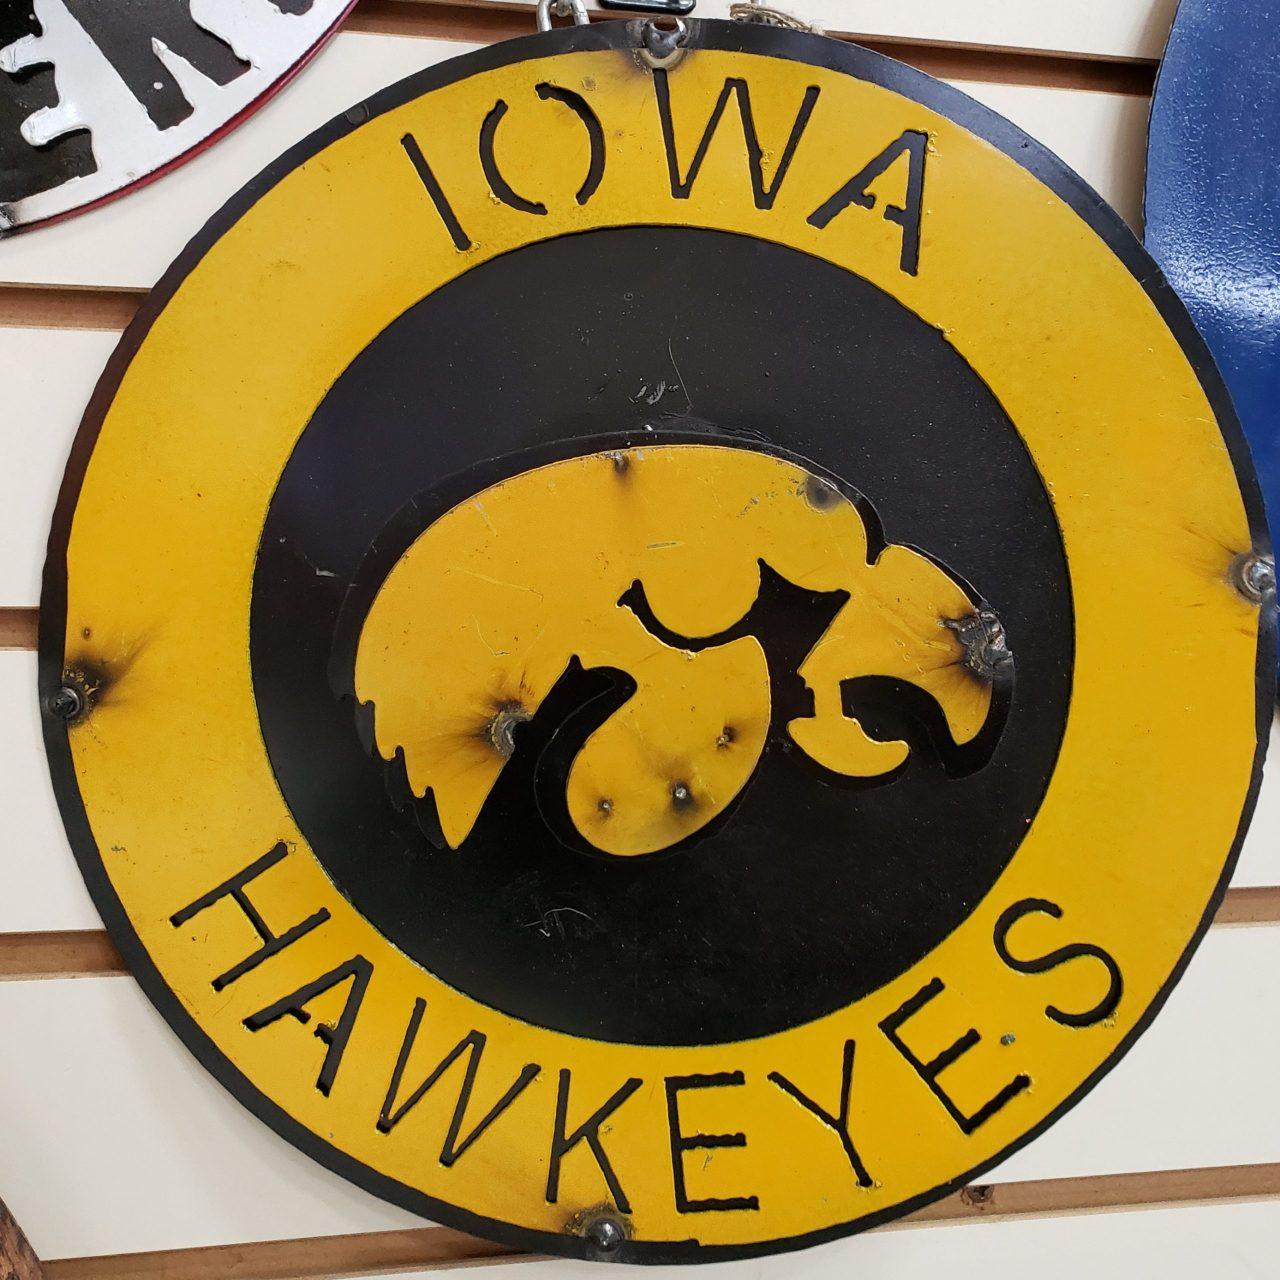 Iowa Hawkeyes 2